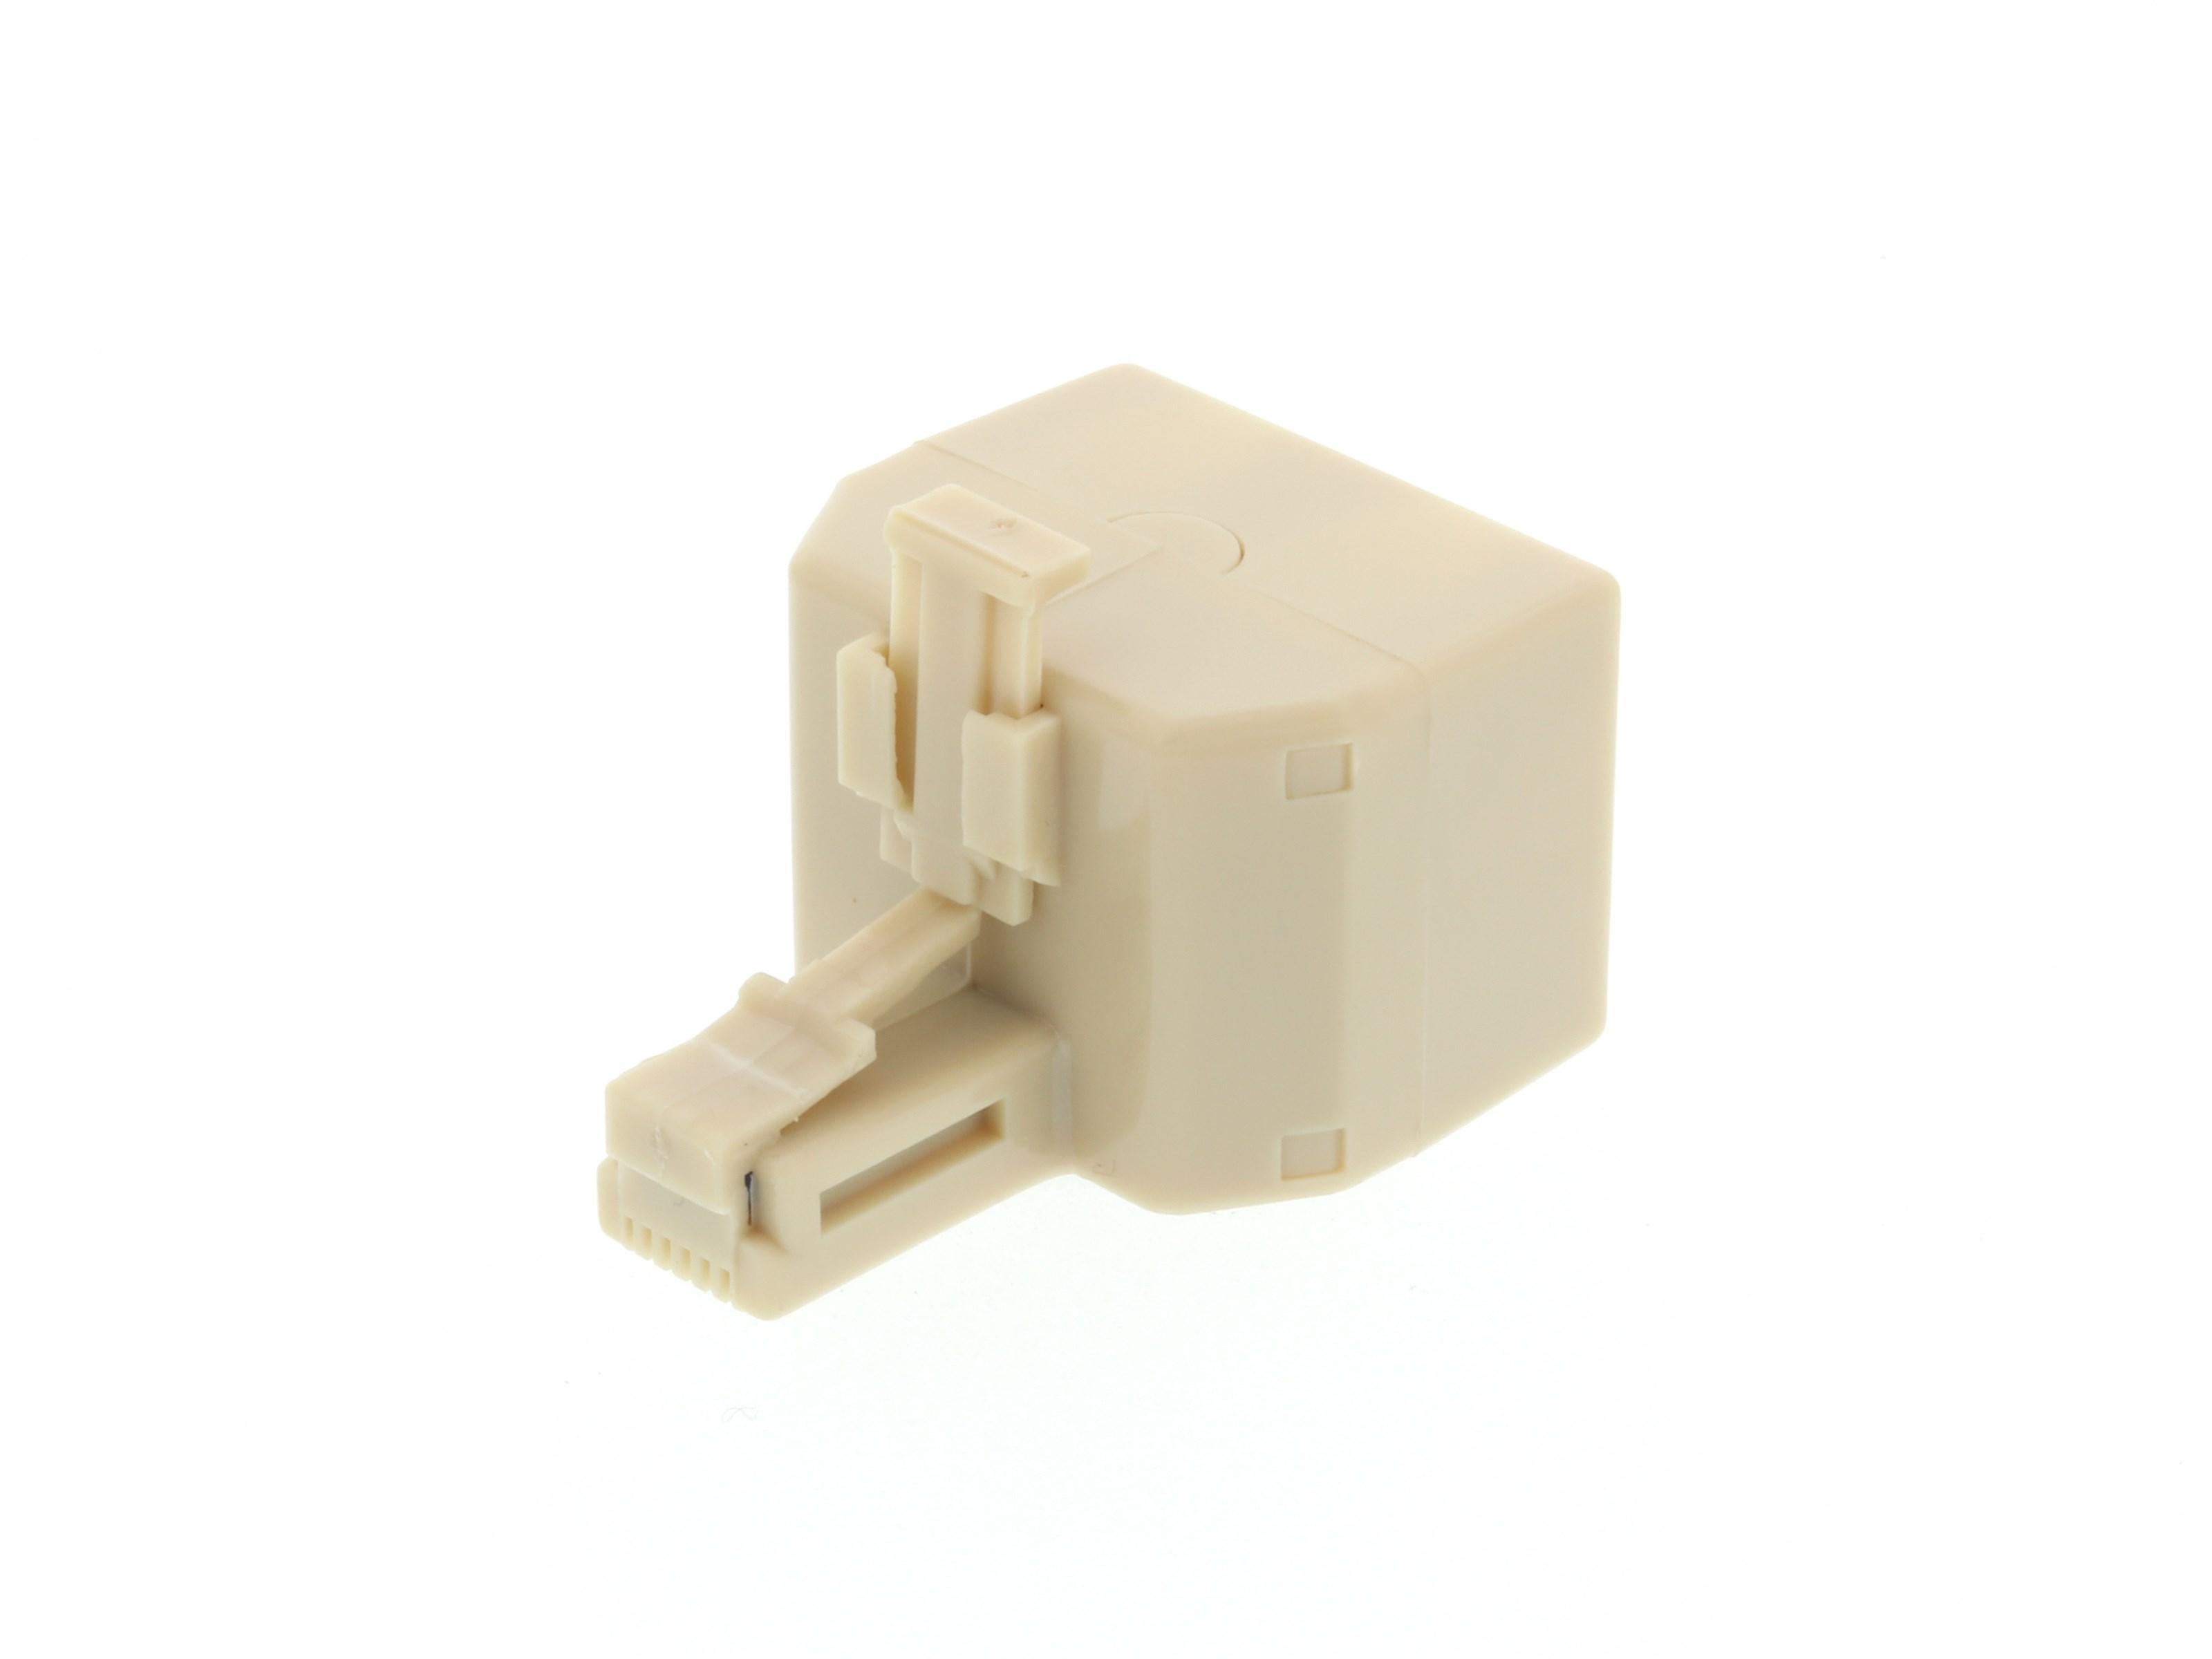 6m Modularkabel Westernkabel 2x RJ12 Stecker 6P6C ISDN Fax Modem Telefon 1:1